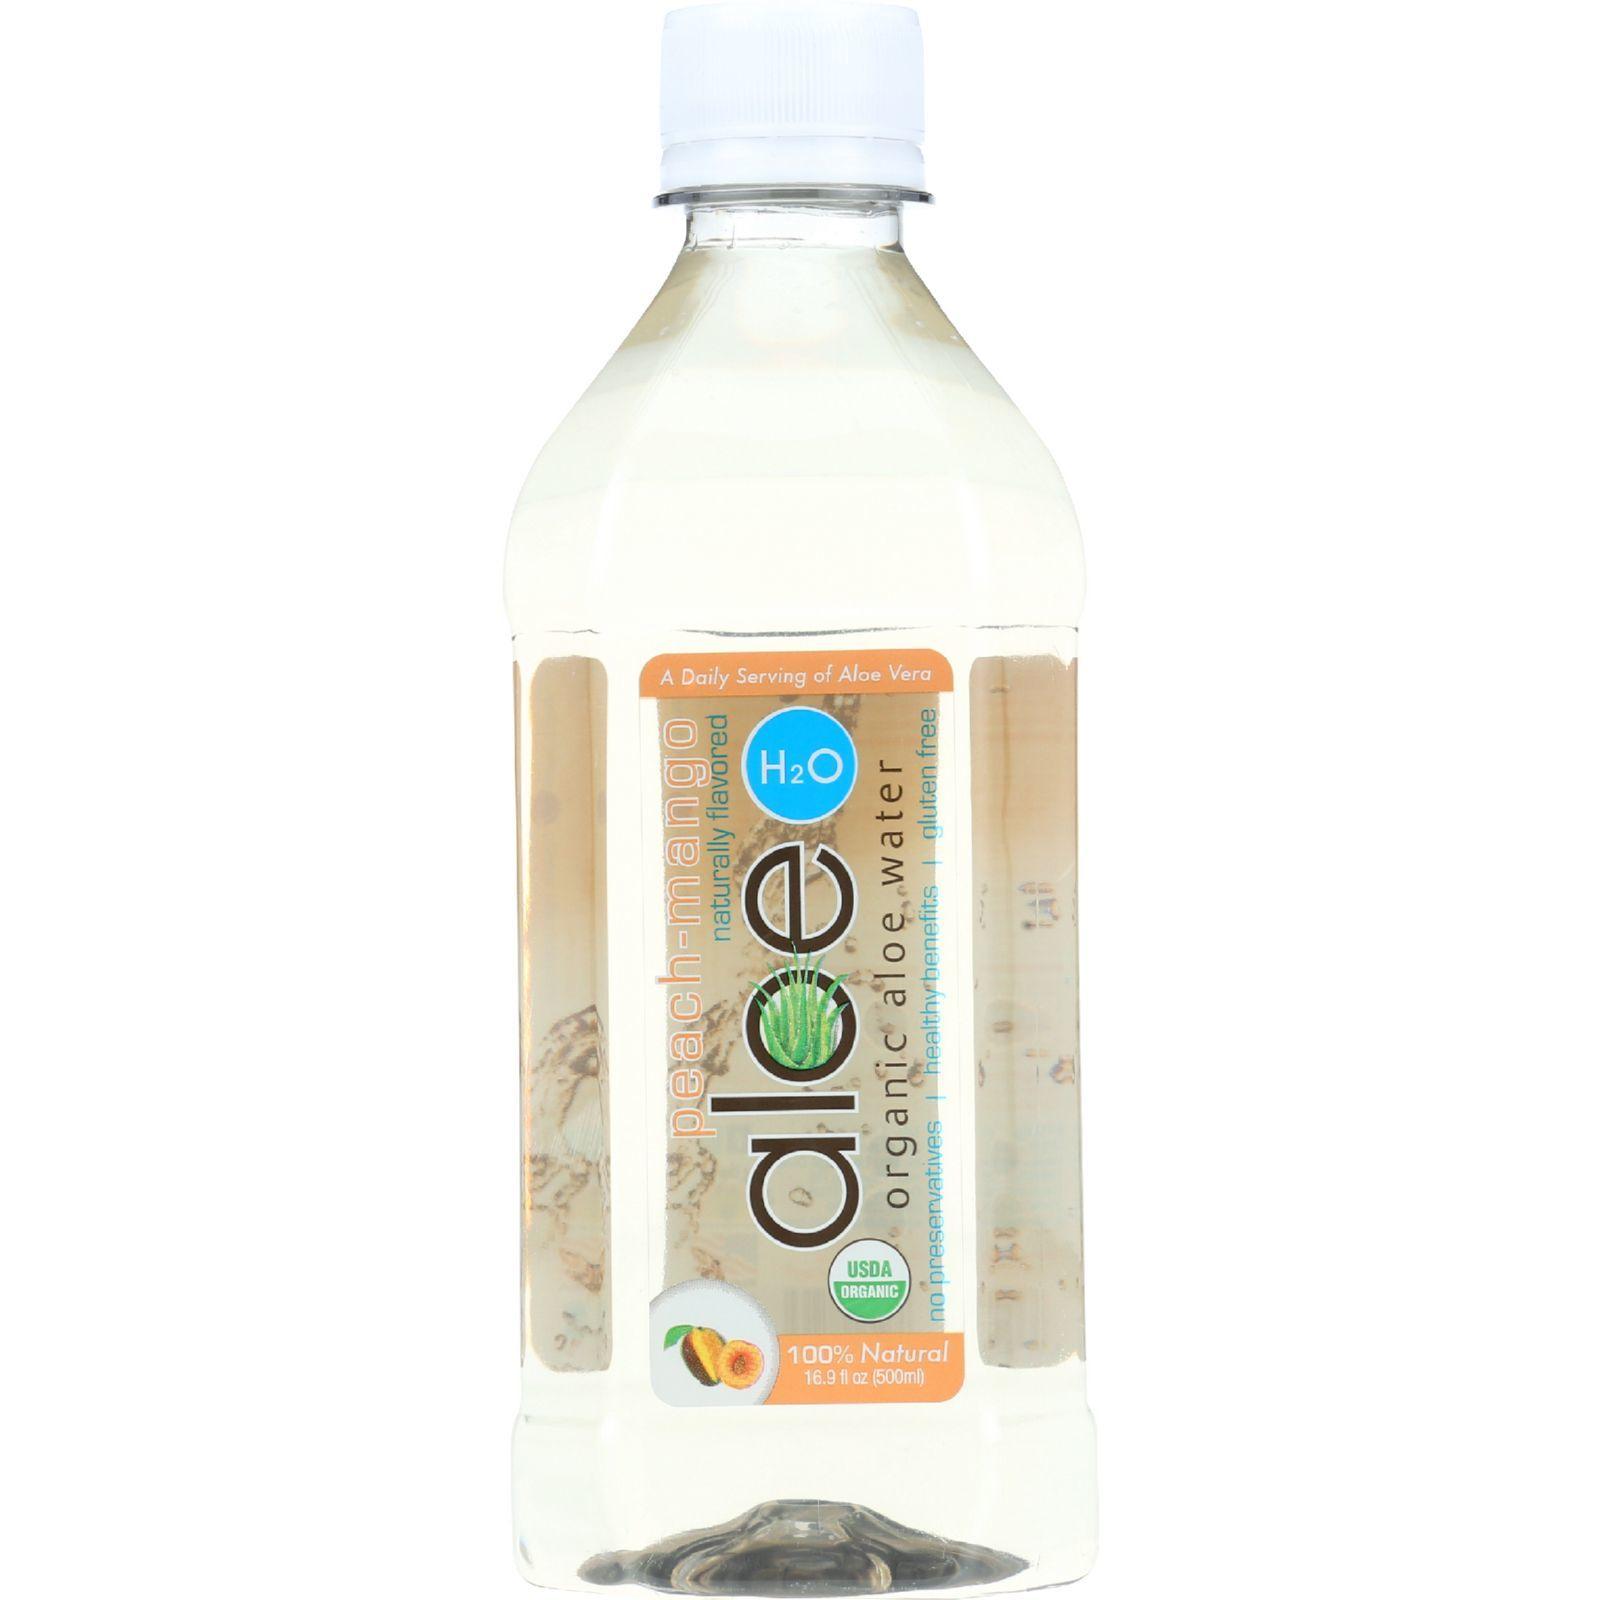 Lily Of The Desert Aloe H2O - Organic - Peach-Mango - Gluten Free - 16.9 oz - case of 12